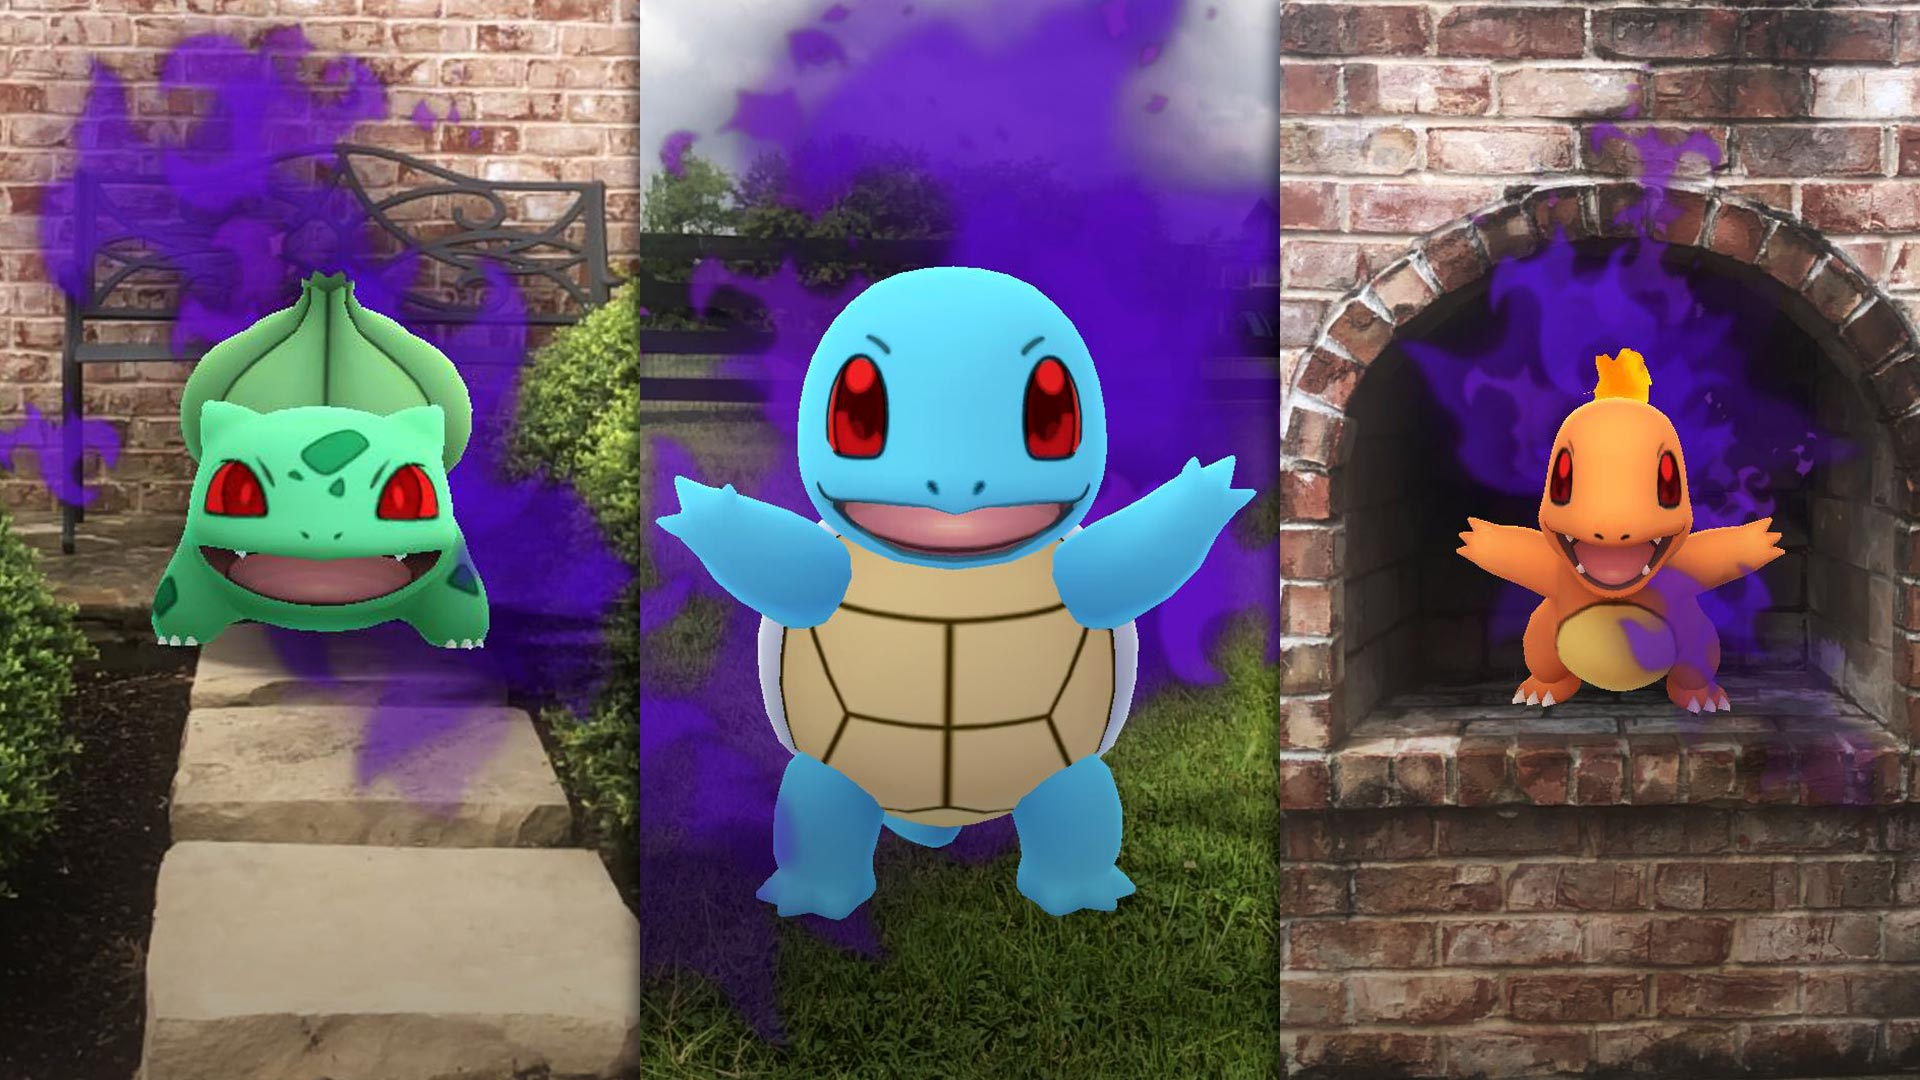 shadow pokemon stats